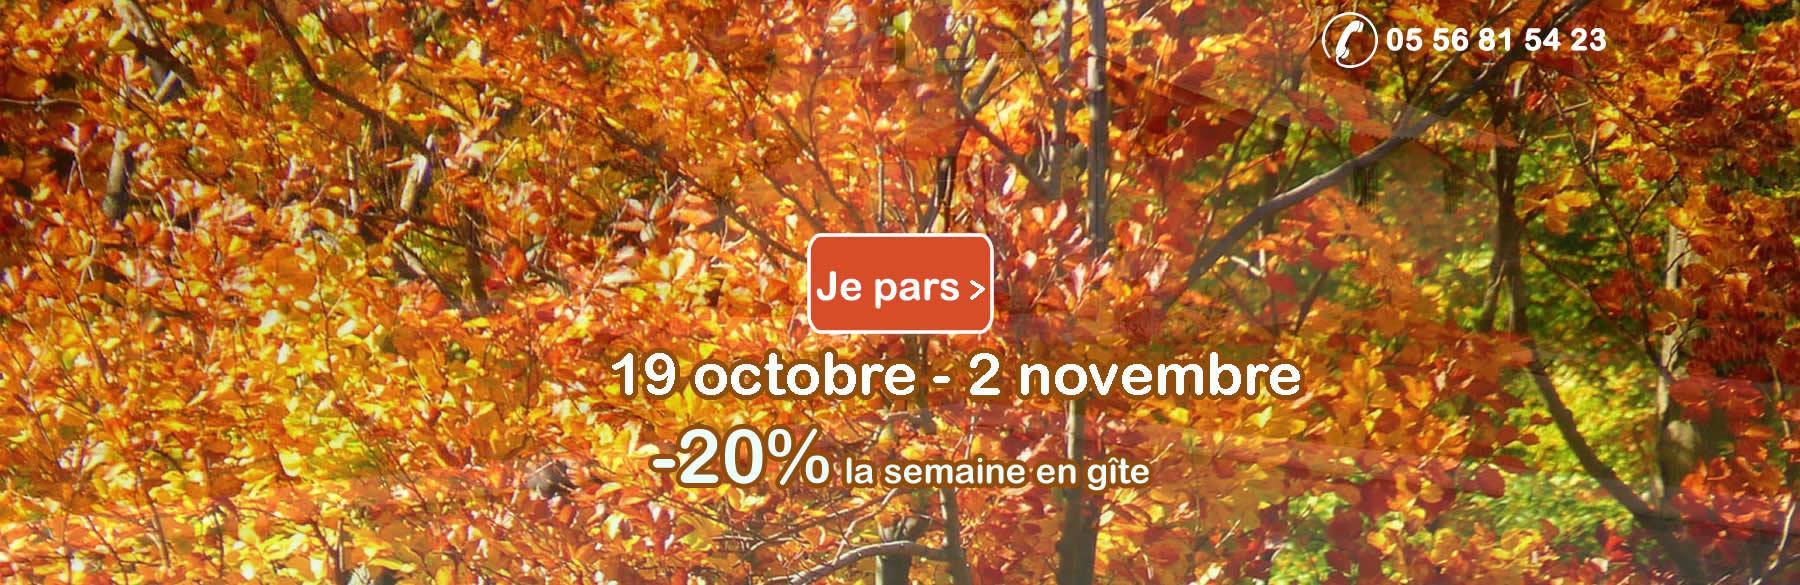 Offre Spéciale Gîte de France Gironde - Gironde - gites-chambres-hotes - location-vacances - week-end - camping - hebergement-plein-air - courts-sejours